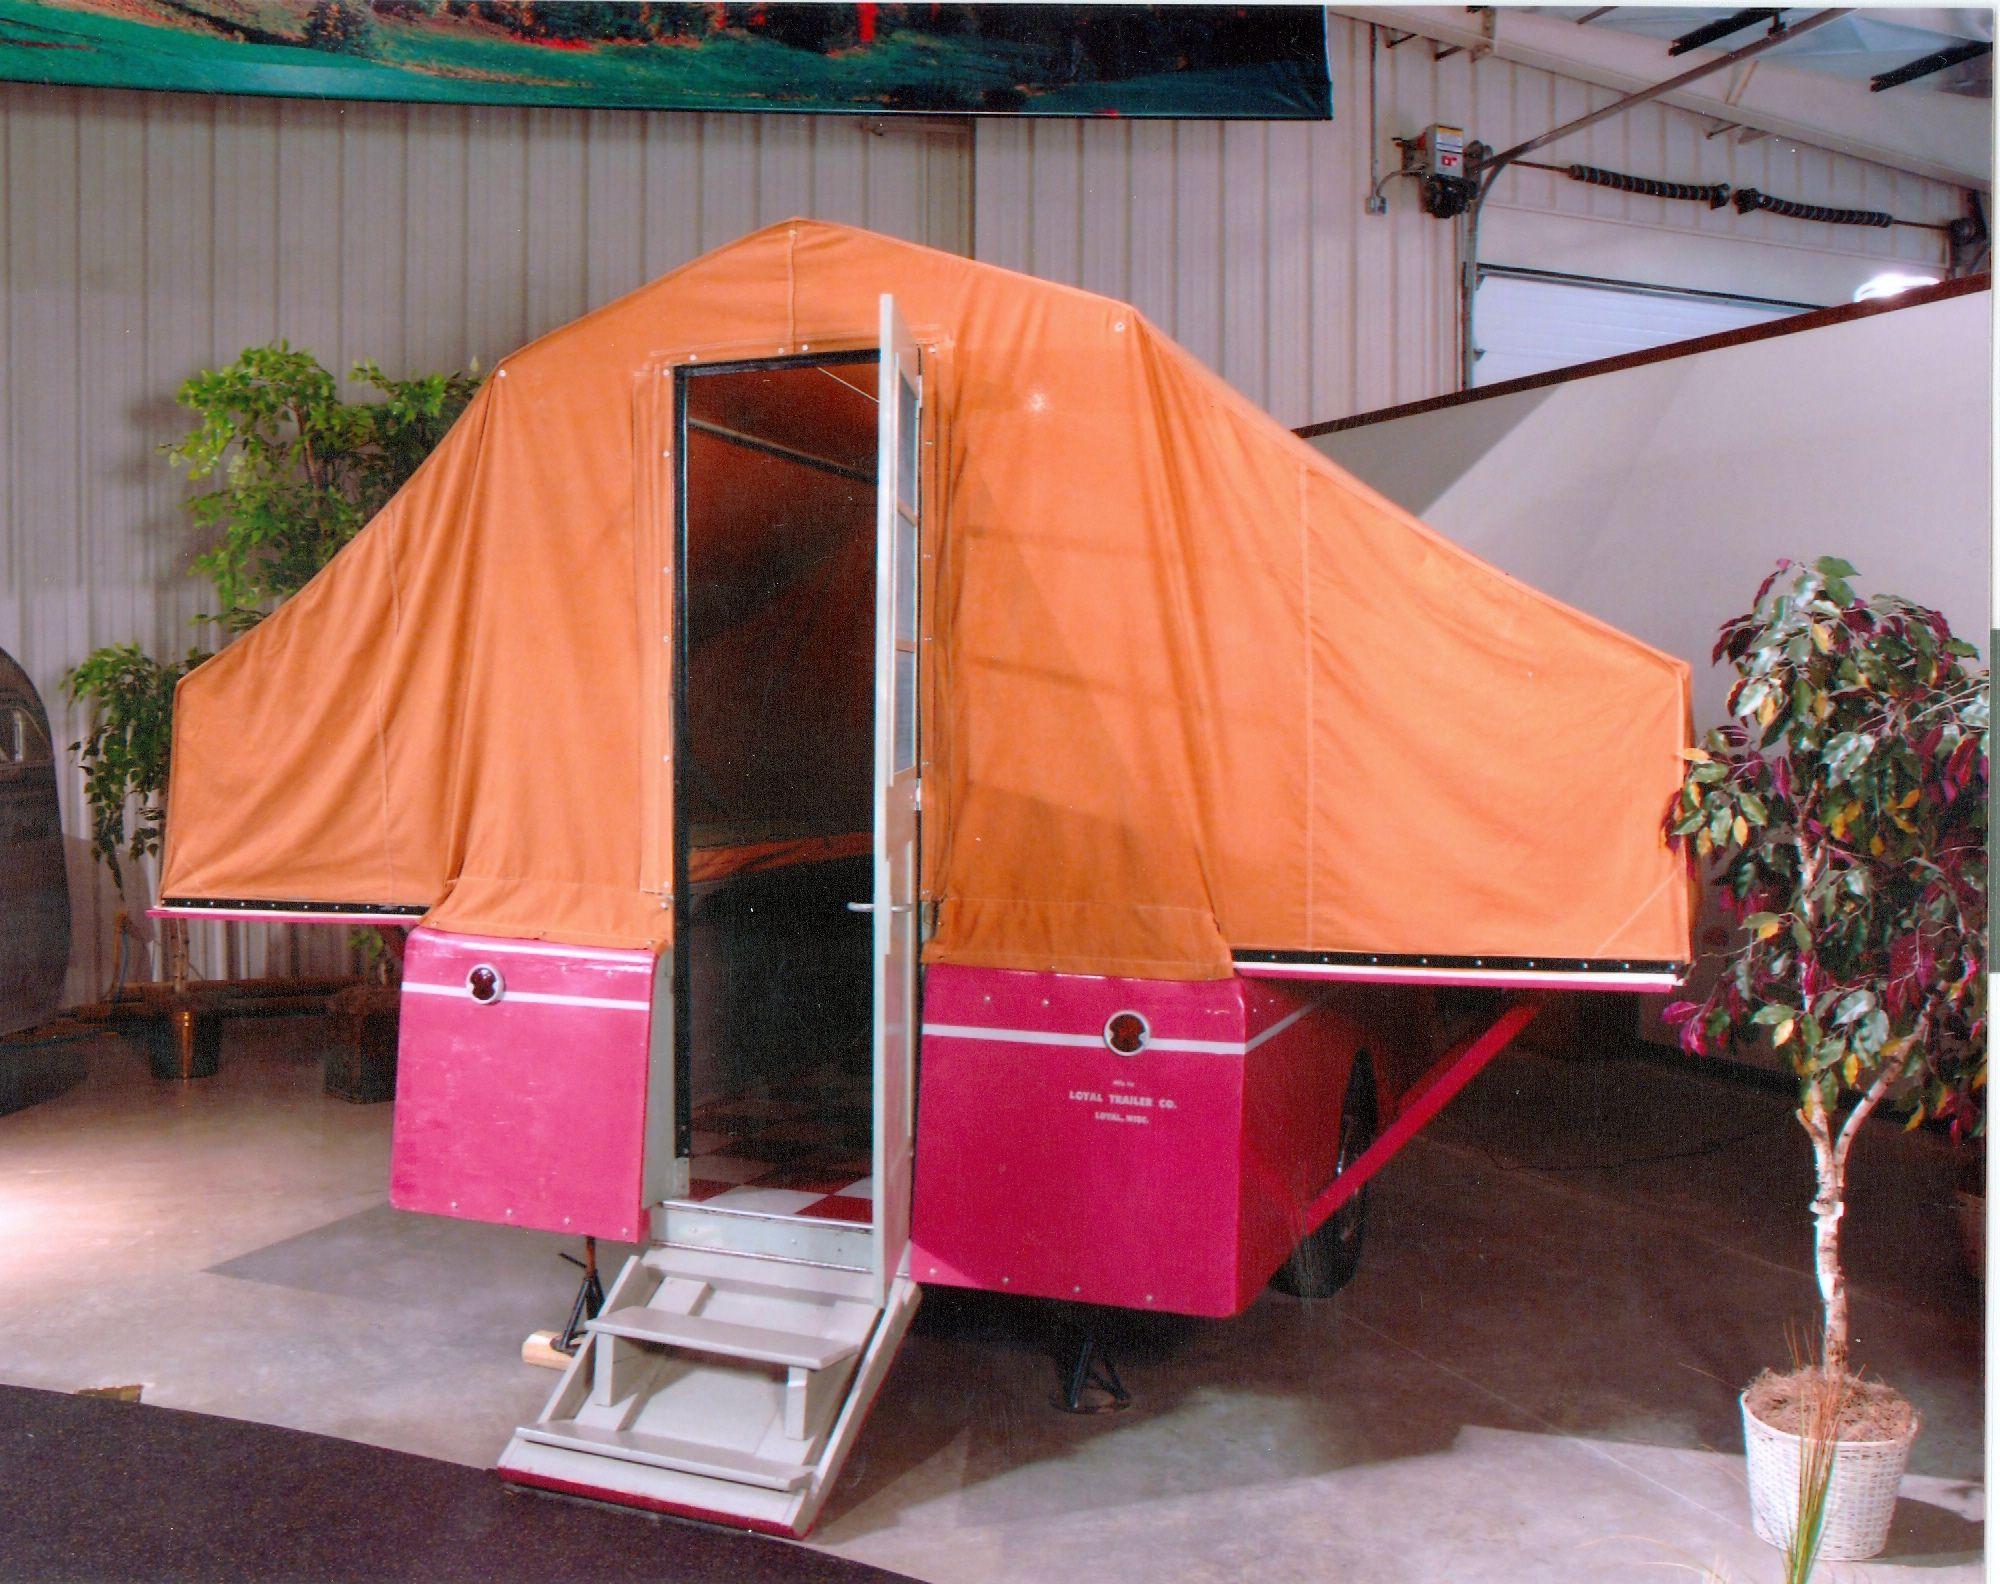 1956 E Z Kamper Tent Trailer Prototype Pop Up Campers